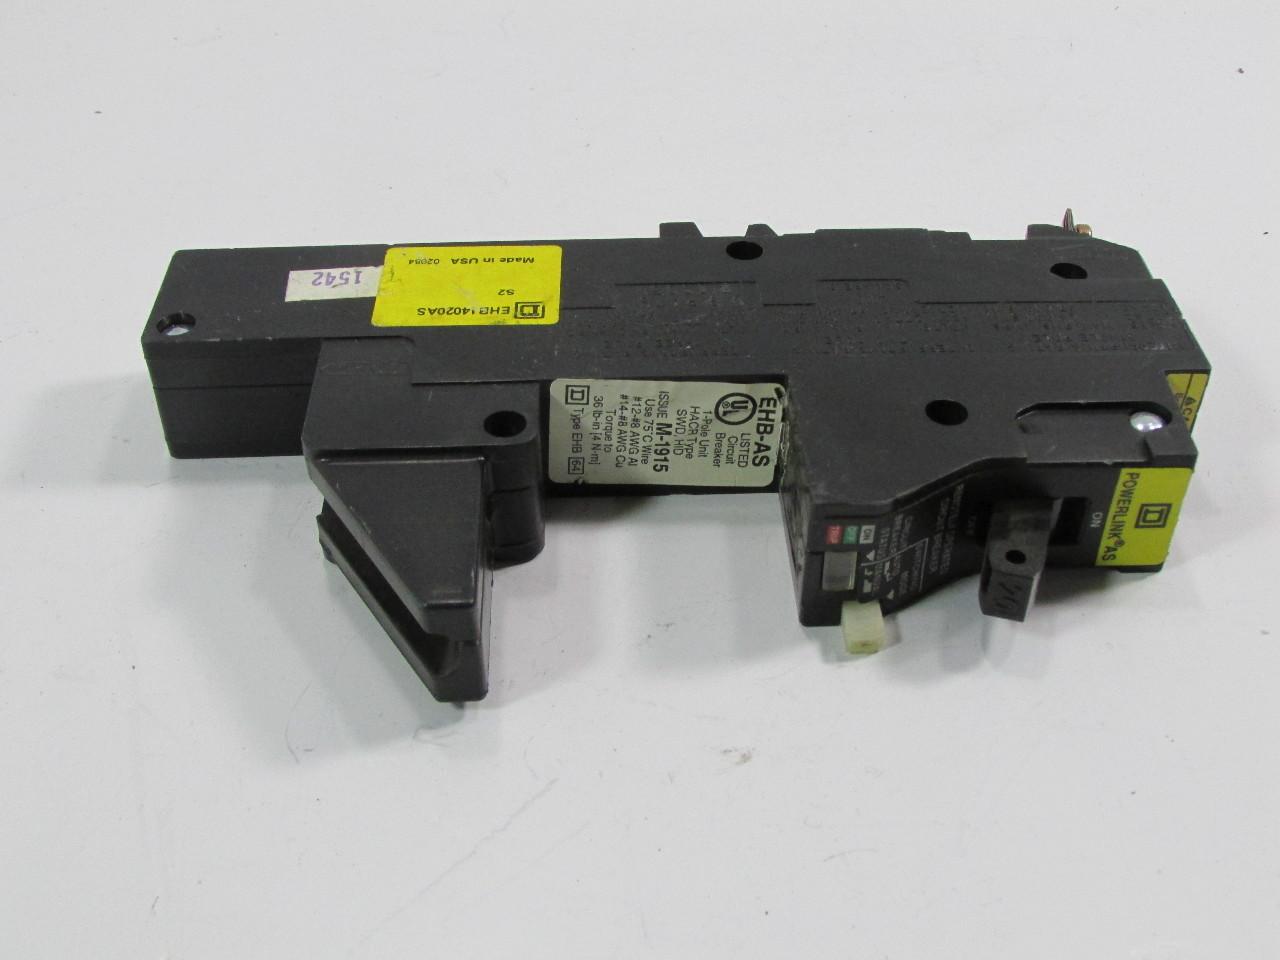 SQUARE D EHB14020AS REMOTE CONTROL CIRCUIT BREAKER EHB AS POWERLINK AS  #B0B219